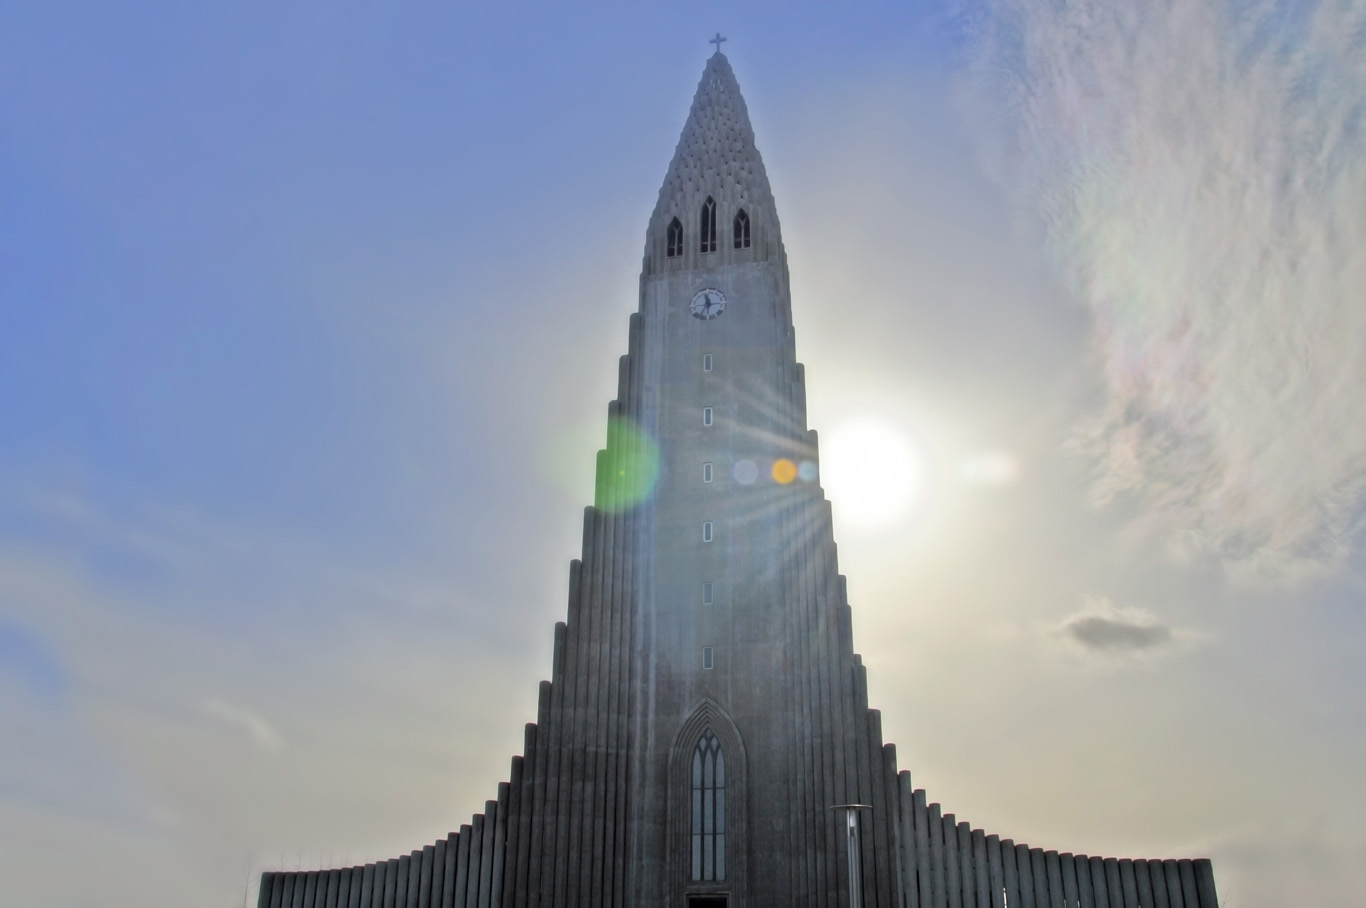 HDR photo of Hallgrímskirkja church